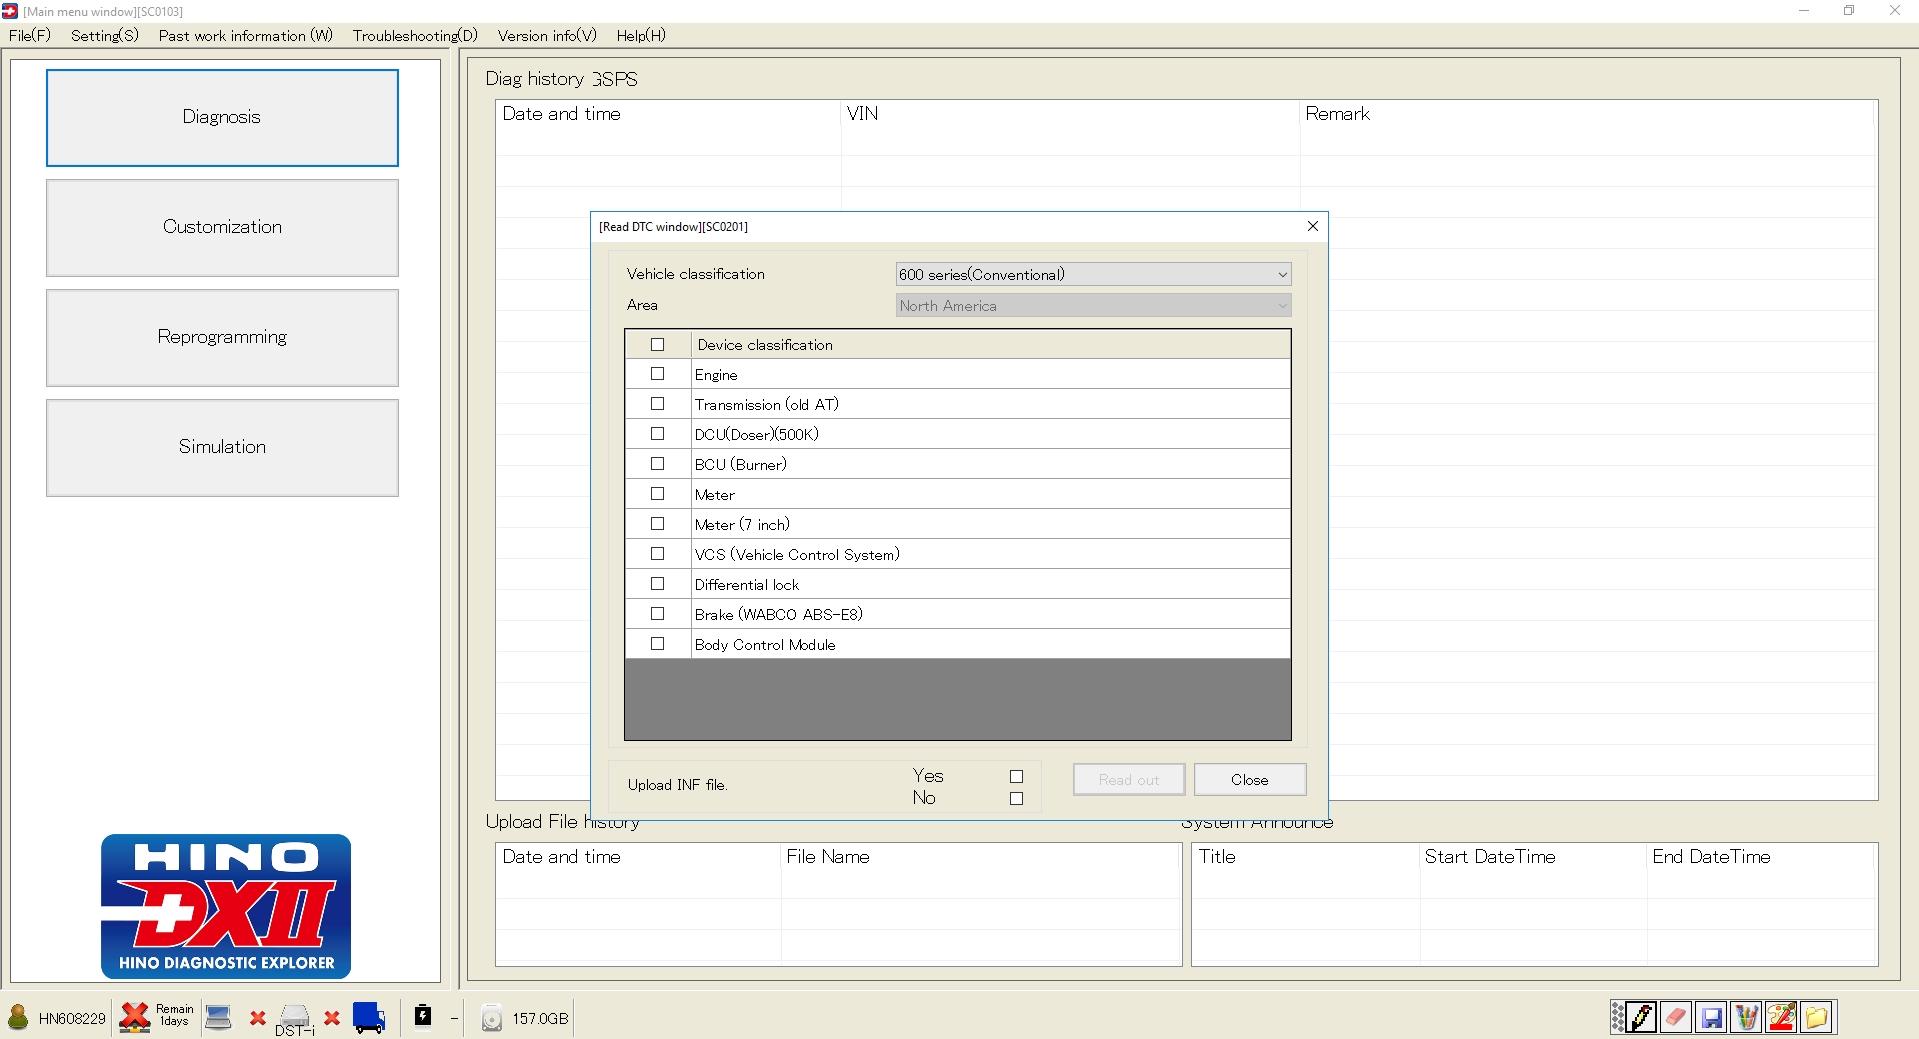 HINO_Diagnostic_eXplorer_DX2_11207_072020_Diagnostic_Software_4